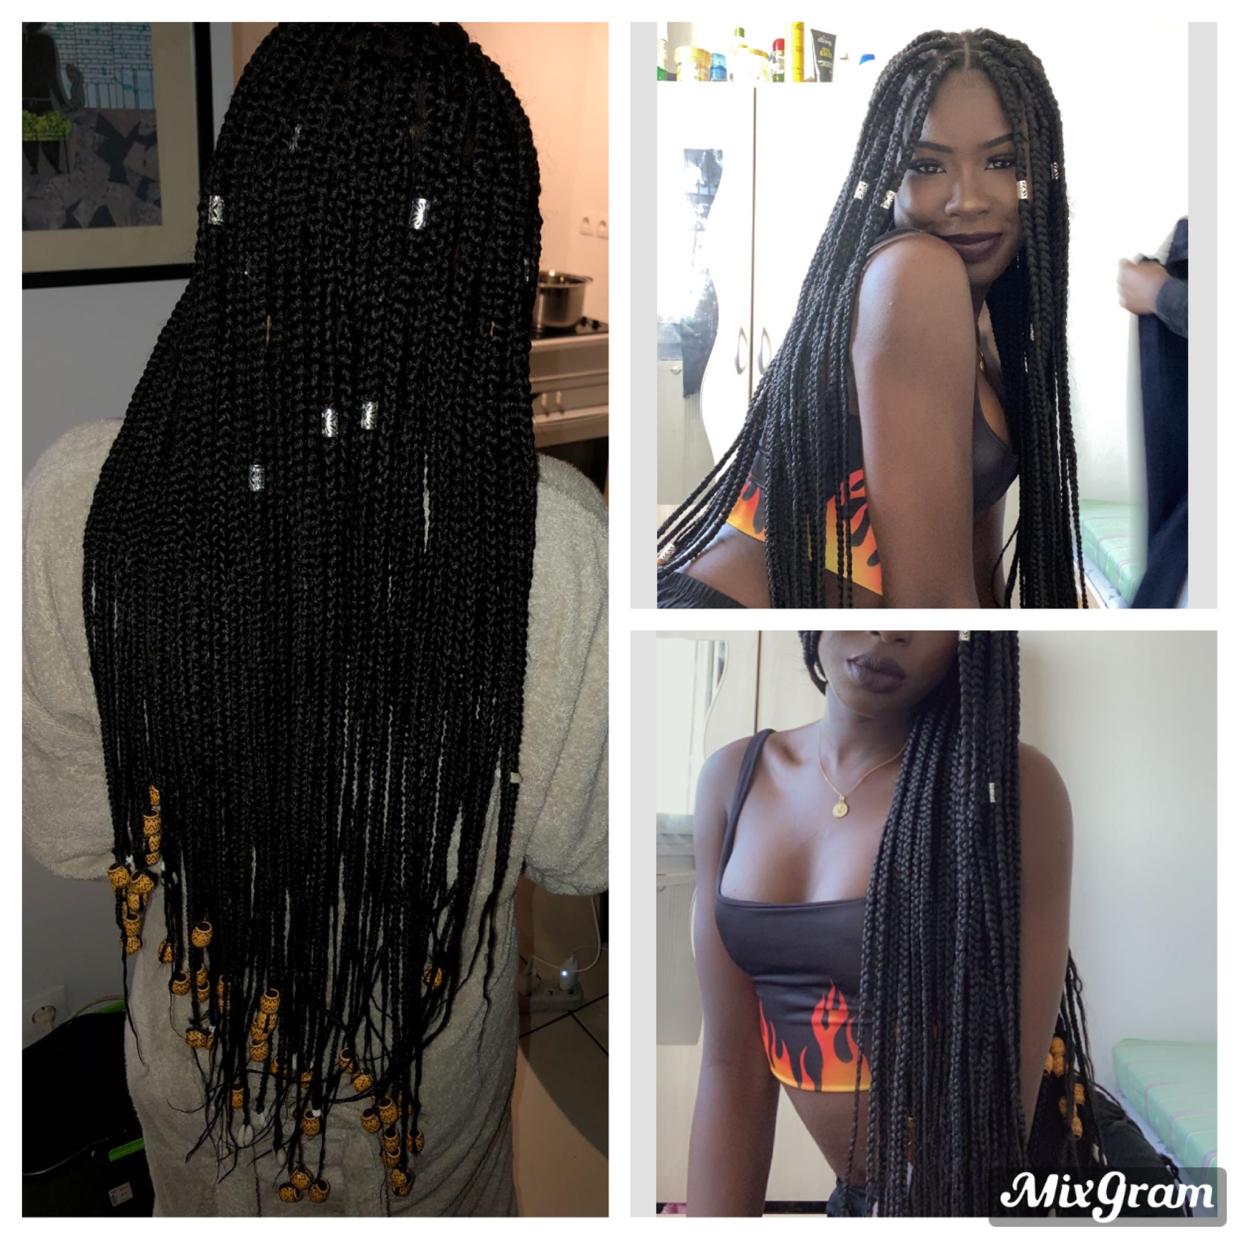 salon de coiffure afro tresse tresses box braids crochet braids vanilles tissages paris 75 77 78 91 92 93 94 95 ULVJNWSN